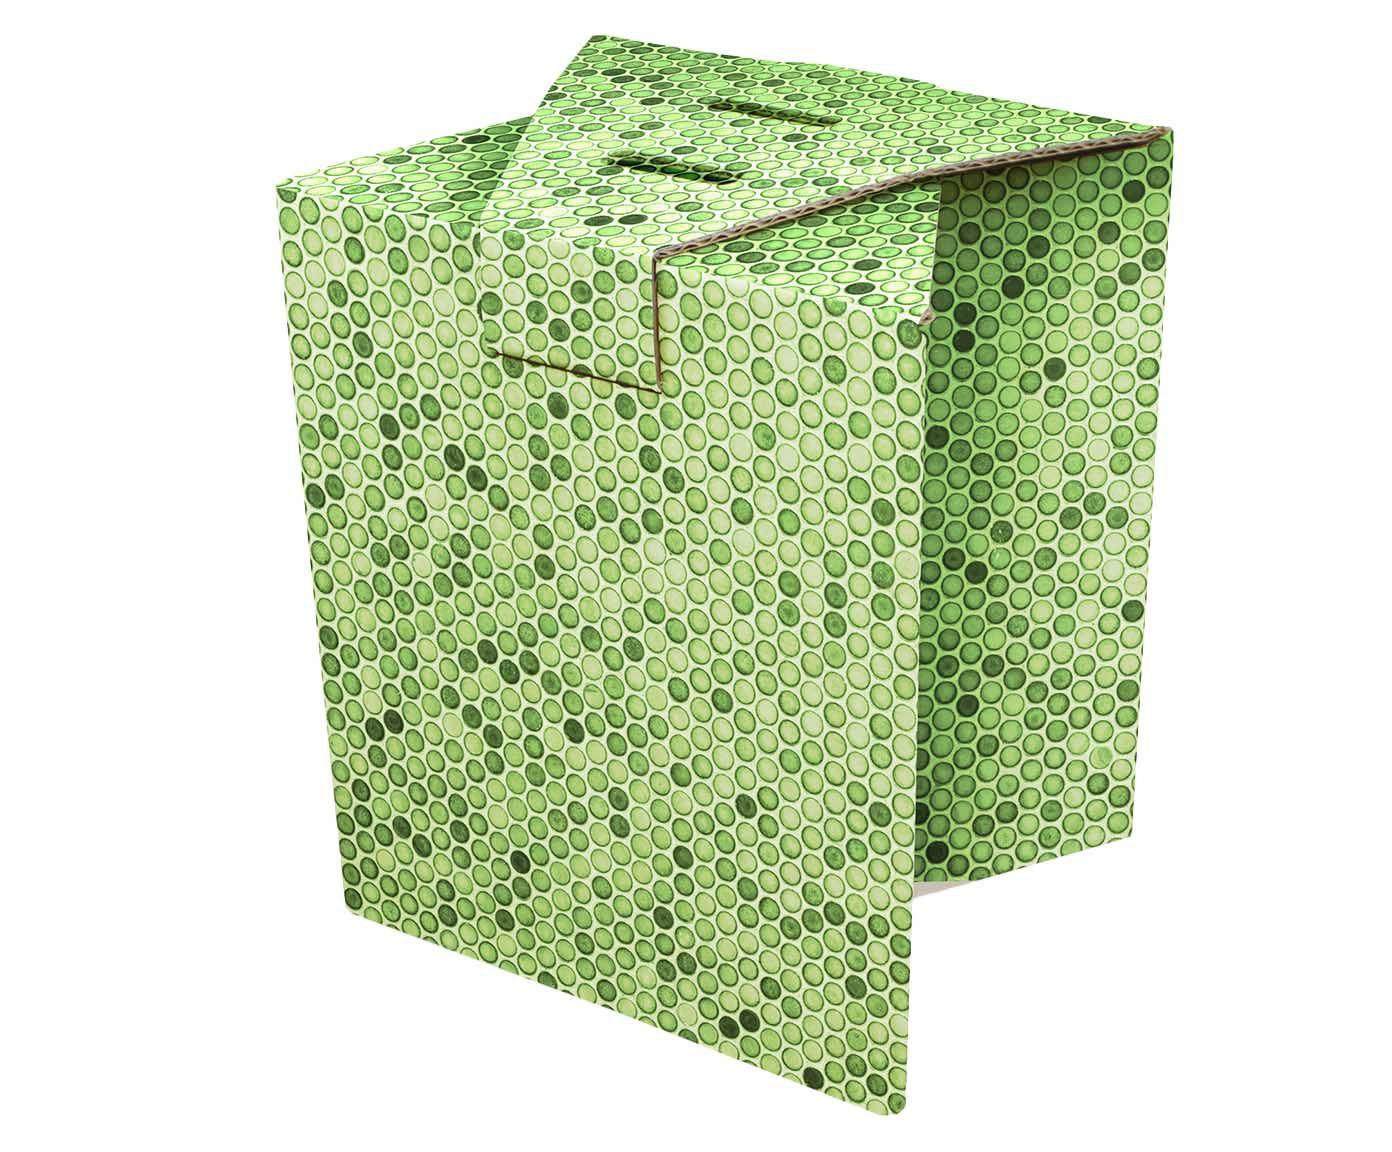 Banco rube mini tiles - energy | Westwing.com.br